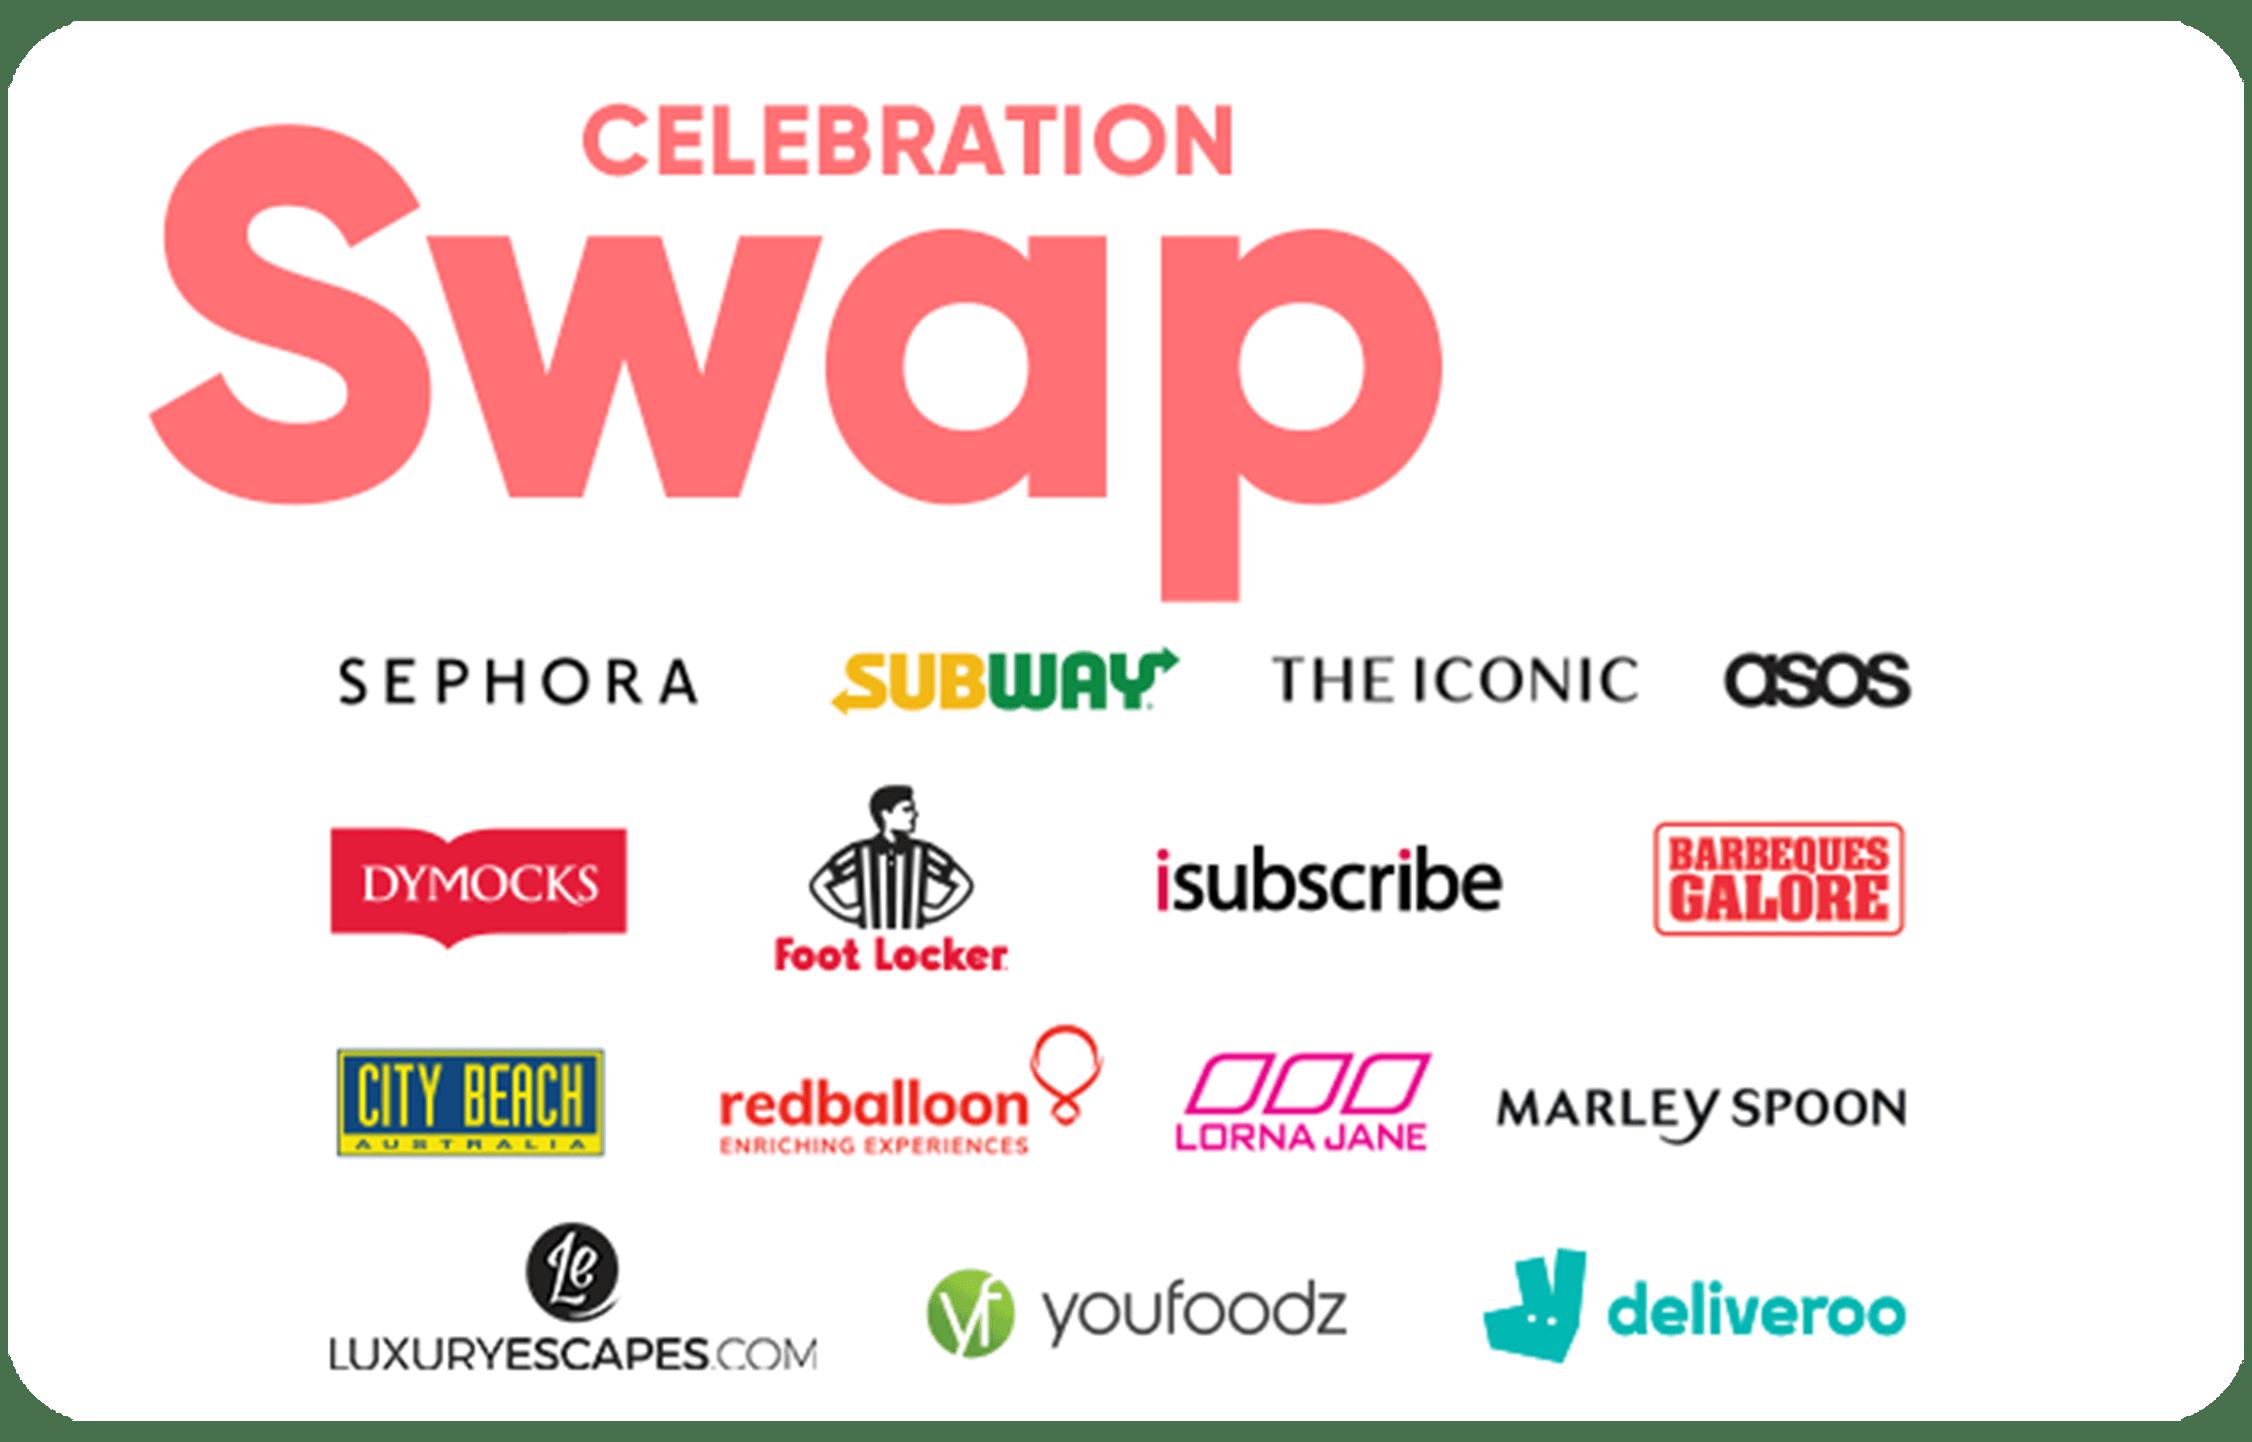 Swap Celebration gift card